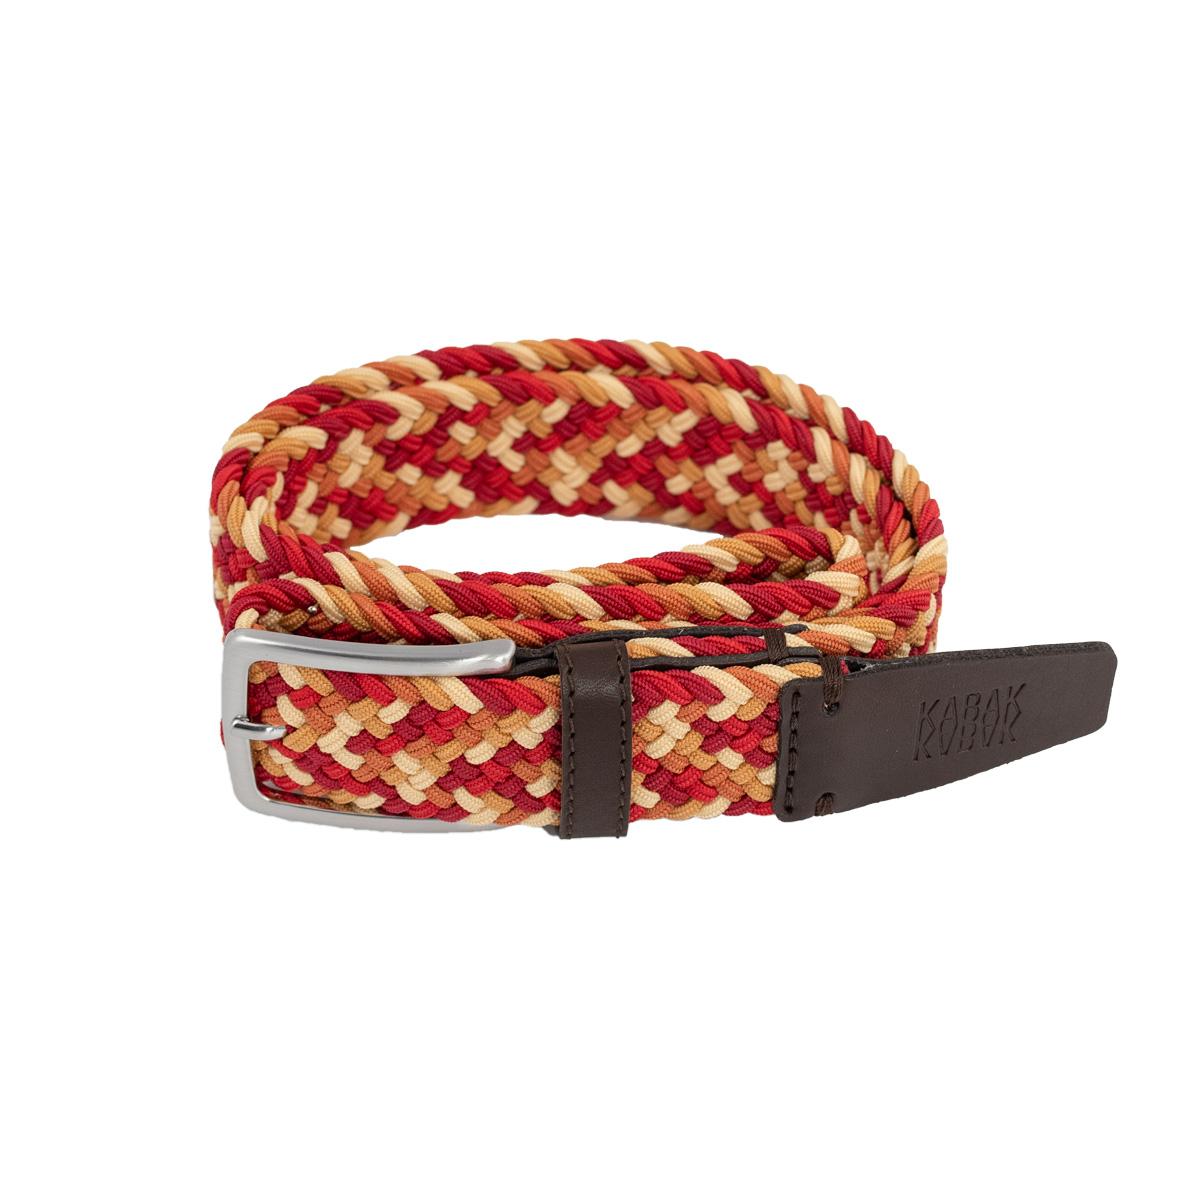 belt_woven_multicolor_C70_kabak_5903678203849_5903678203856